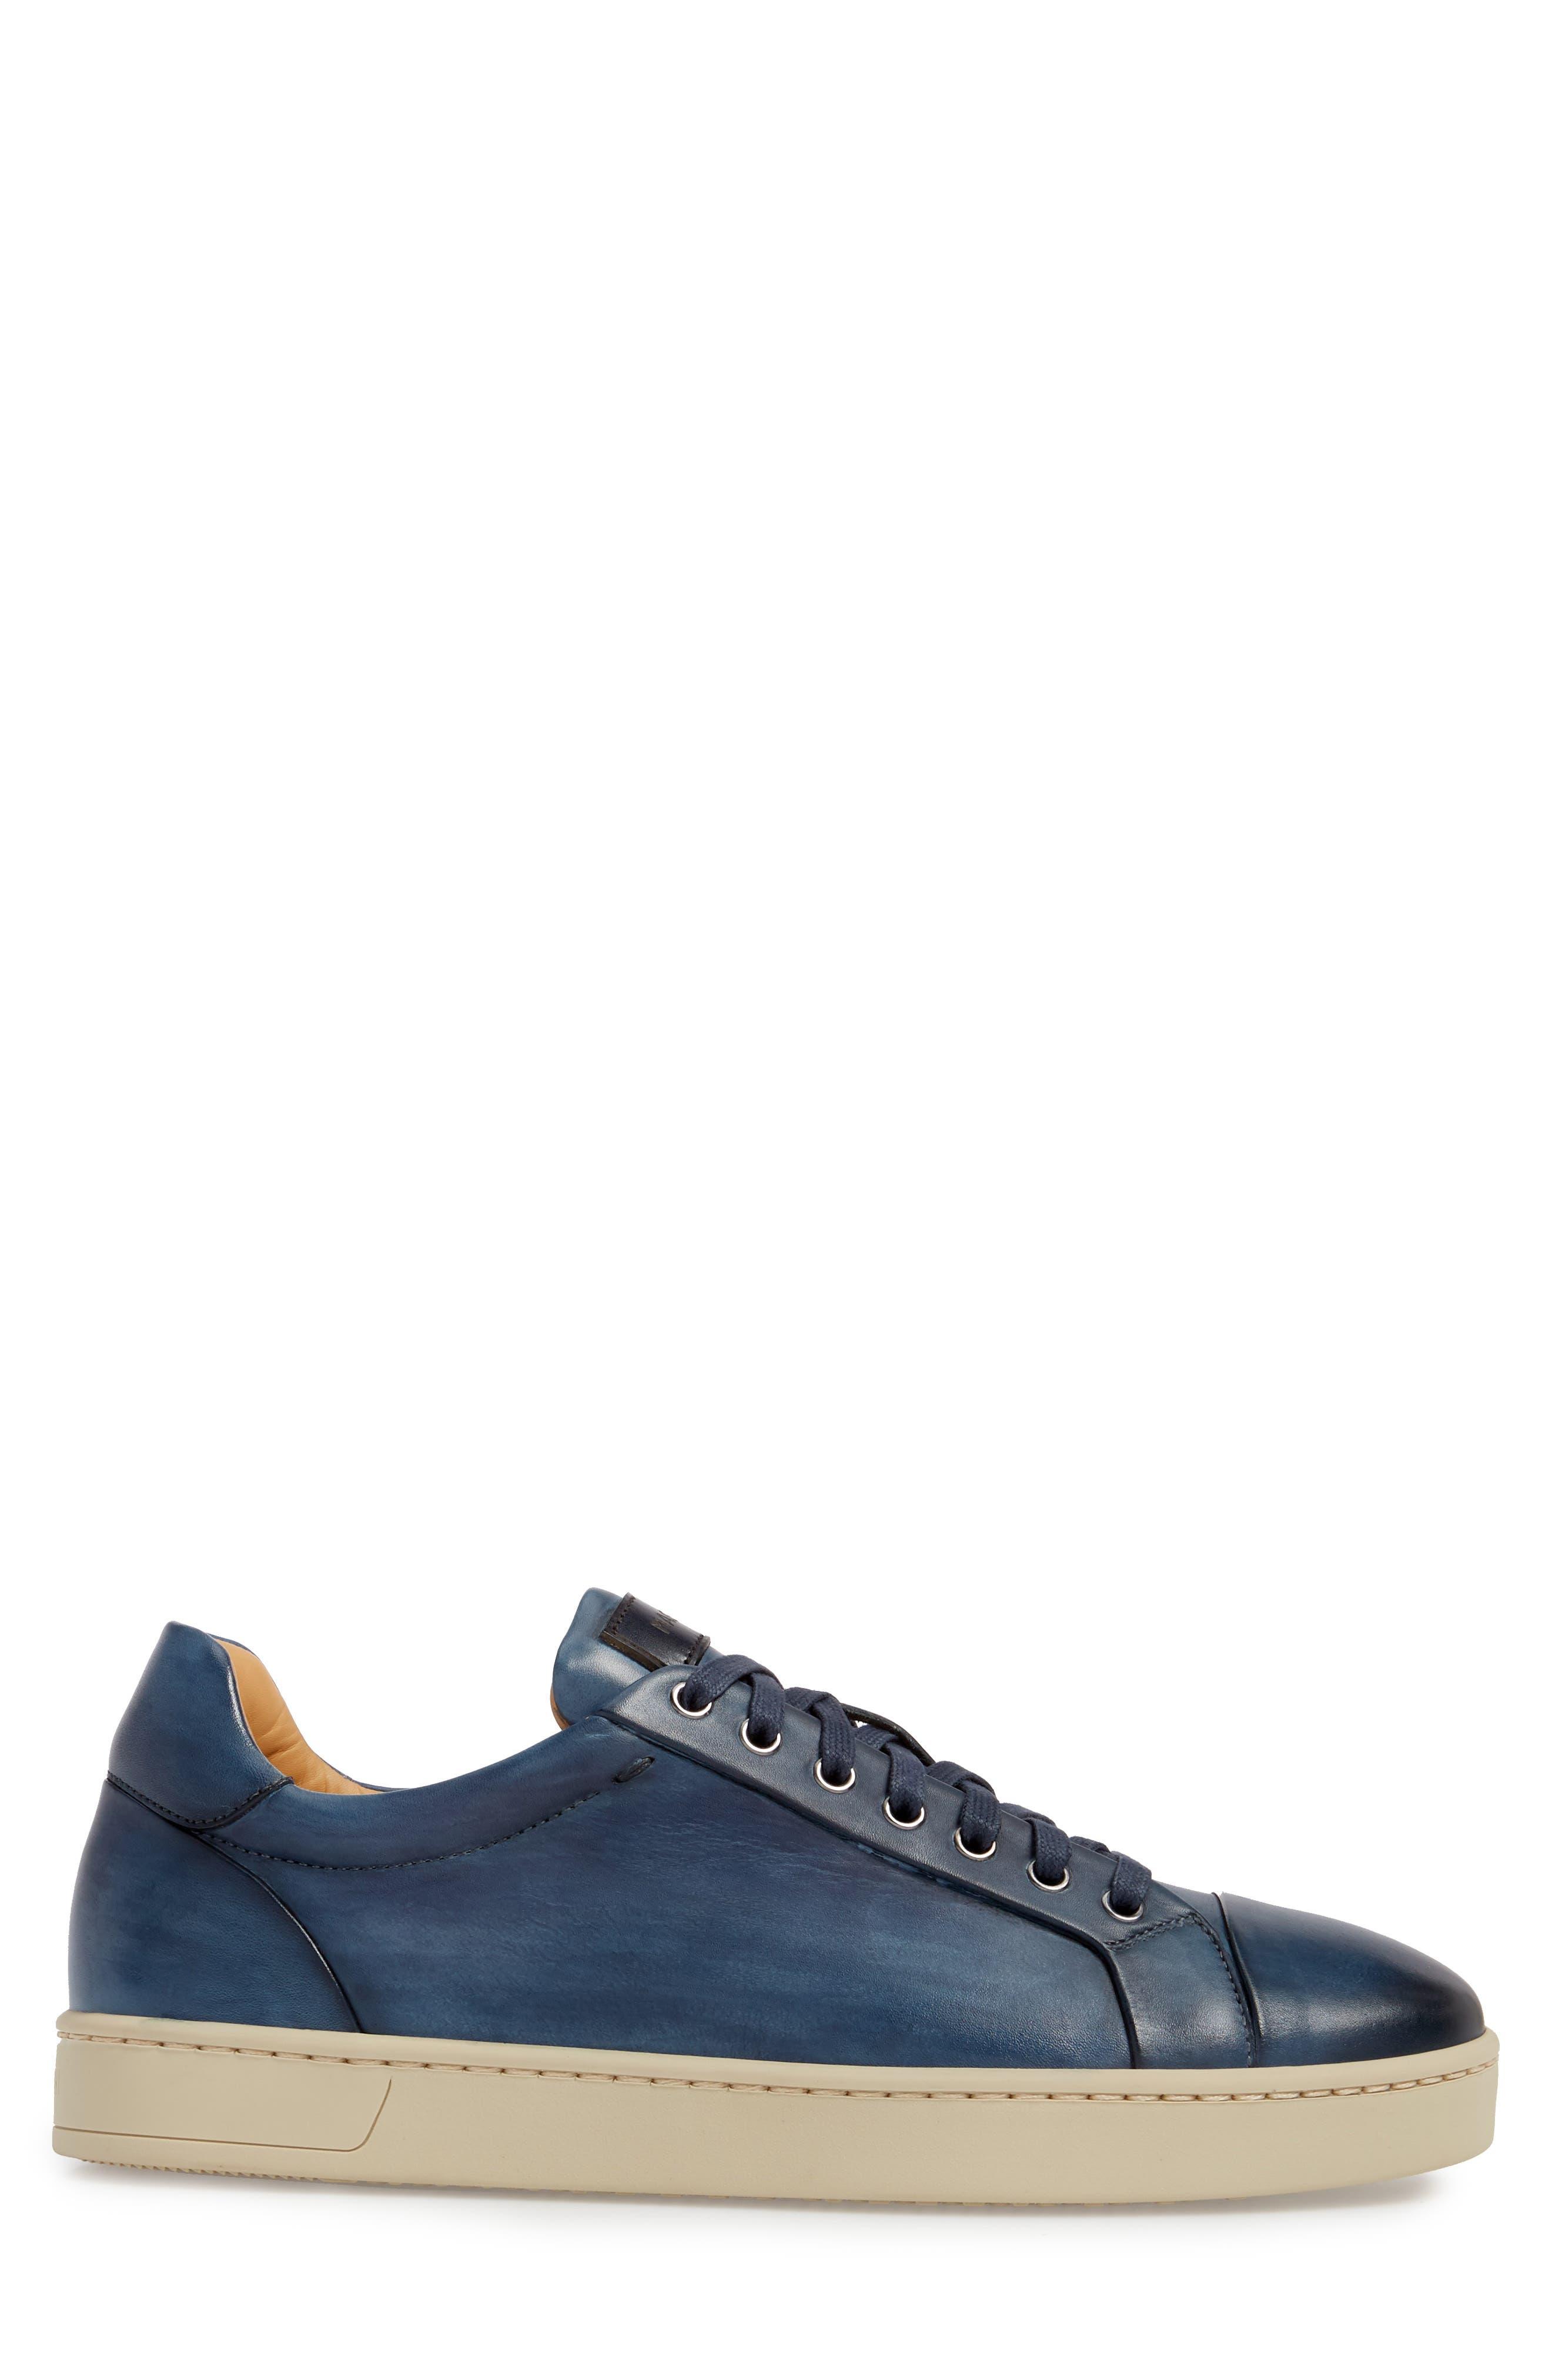 Erardo Low Top Sneaker,                             Alternate thumbnail 3, color,                             BLUE LEATHER